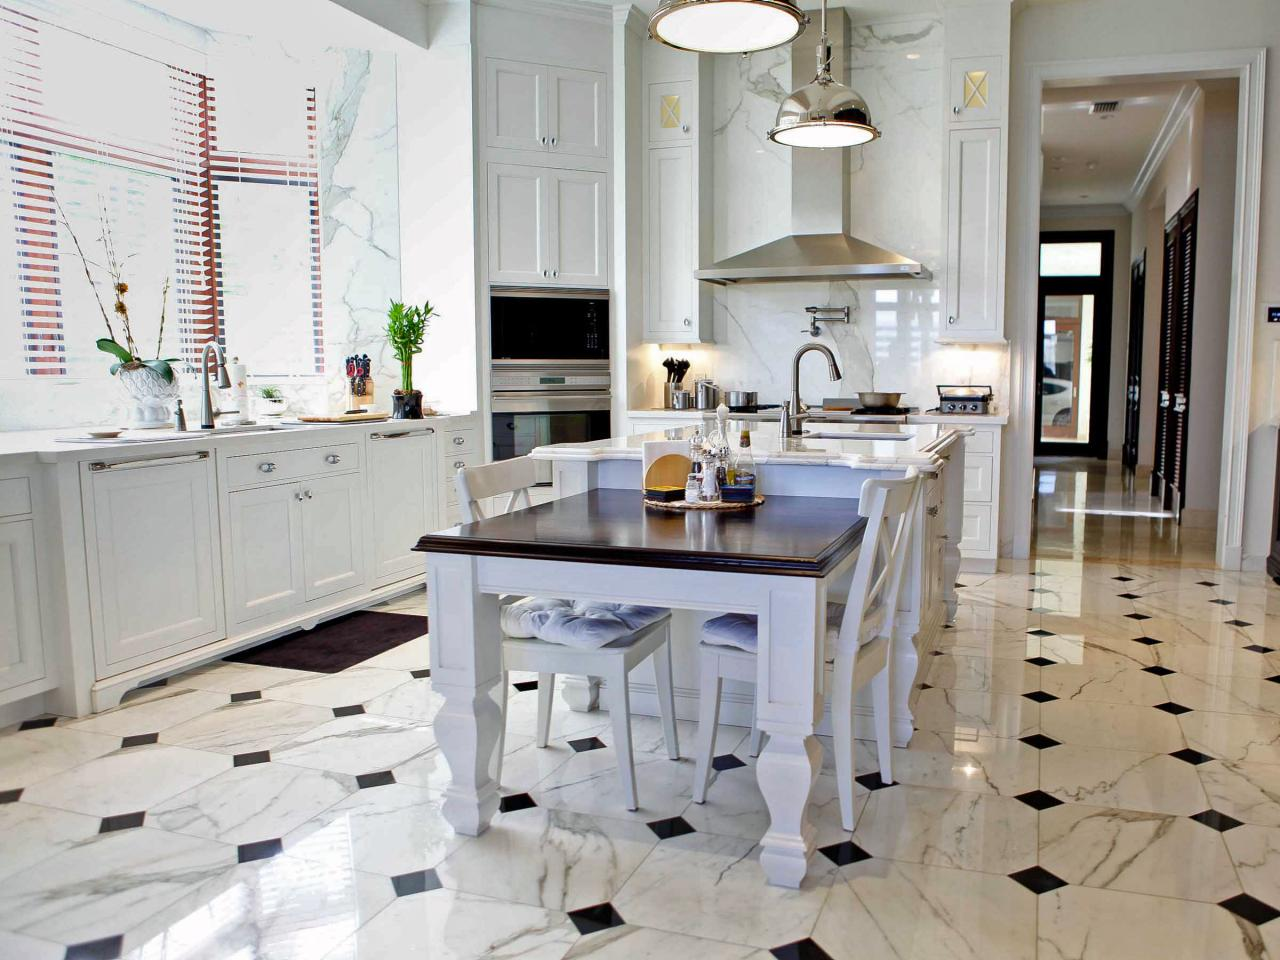 lantai keramik dekorasi dapur titik penyambung berwarna hitam